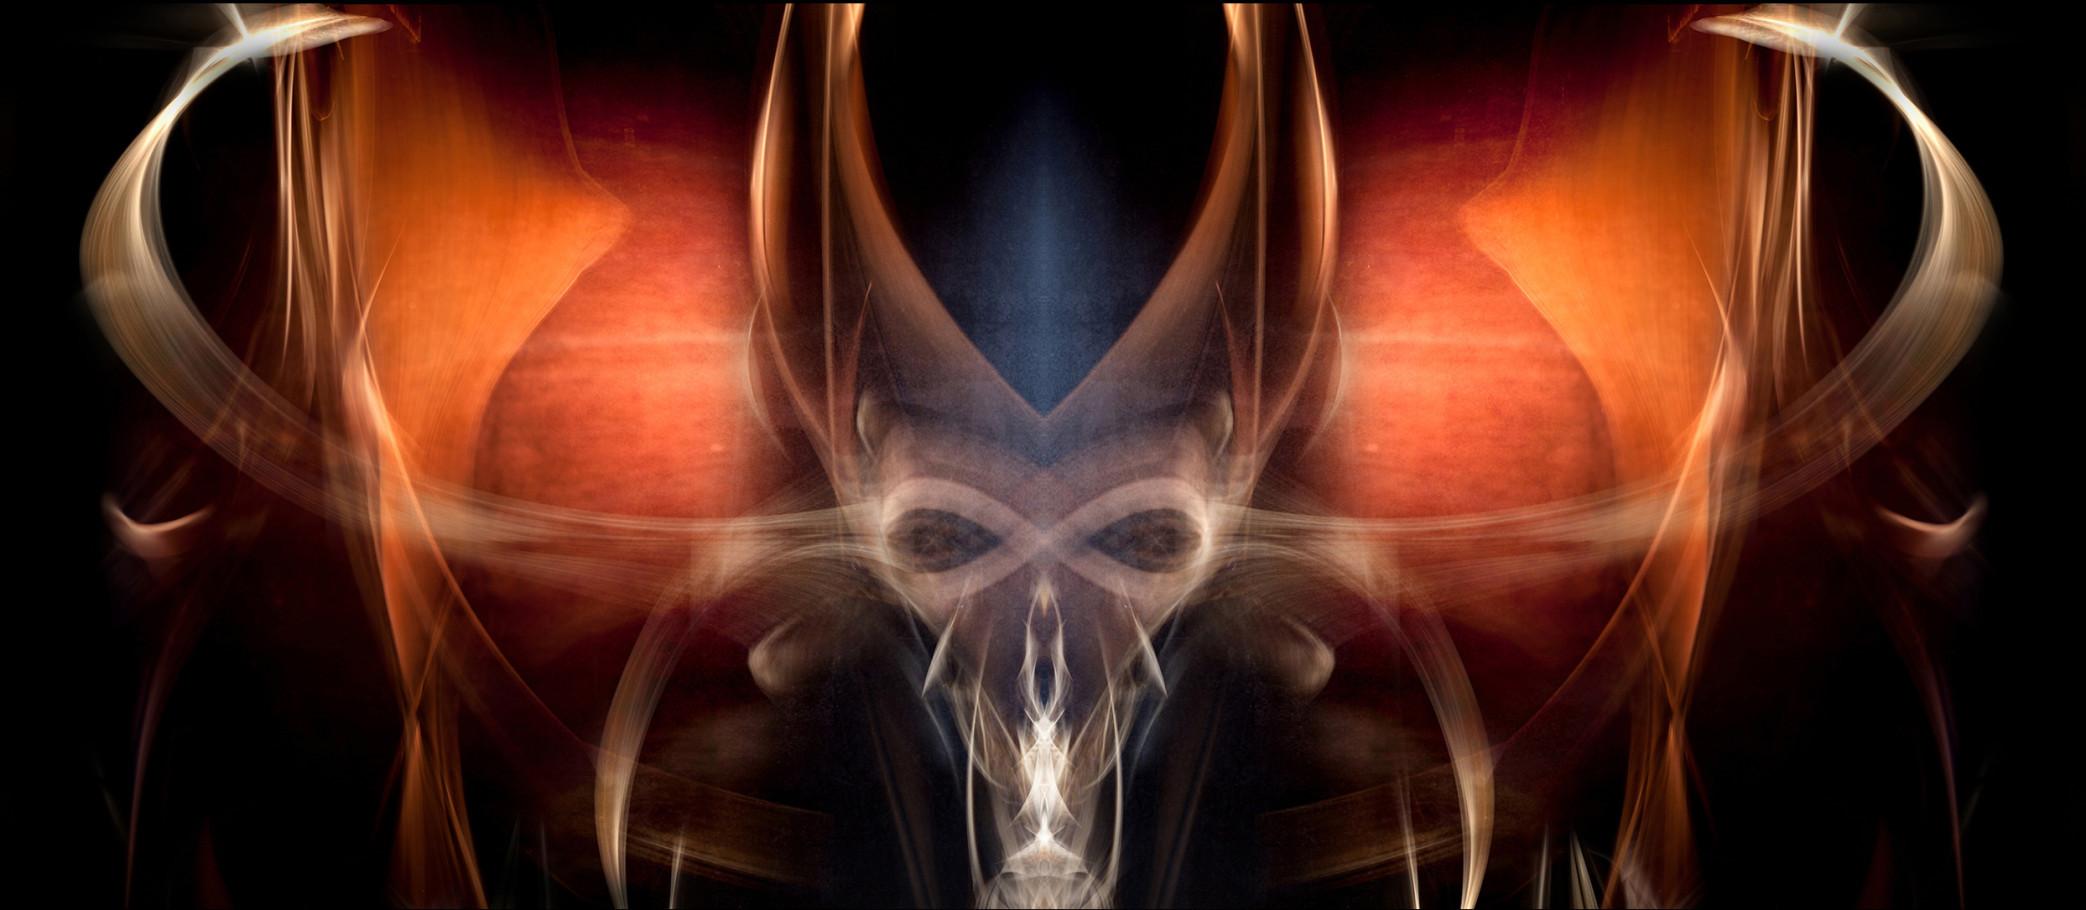 Masks interrogation - 2014